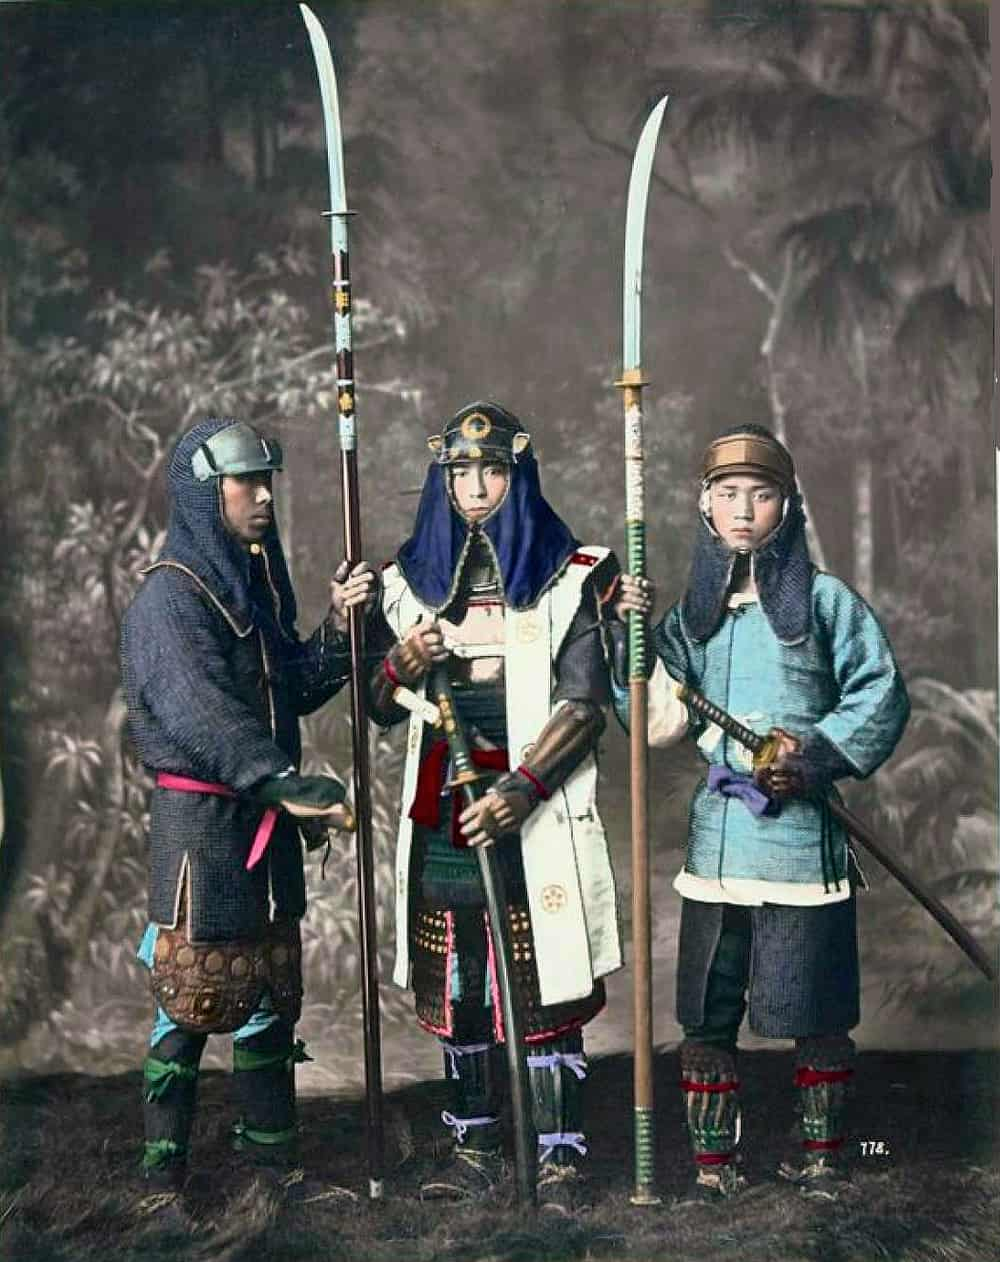 Three Samurai warriors holing Naginatas